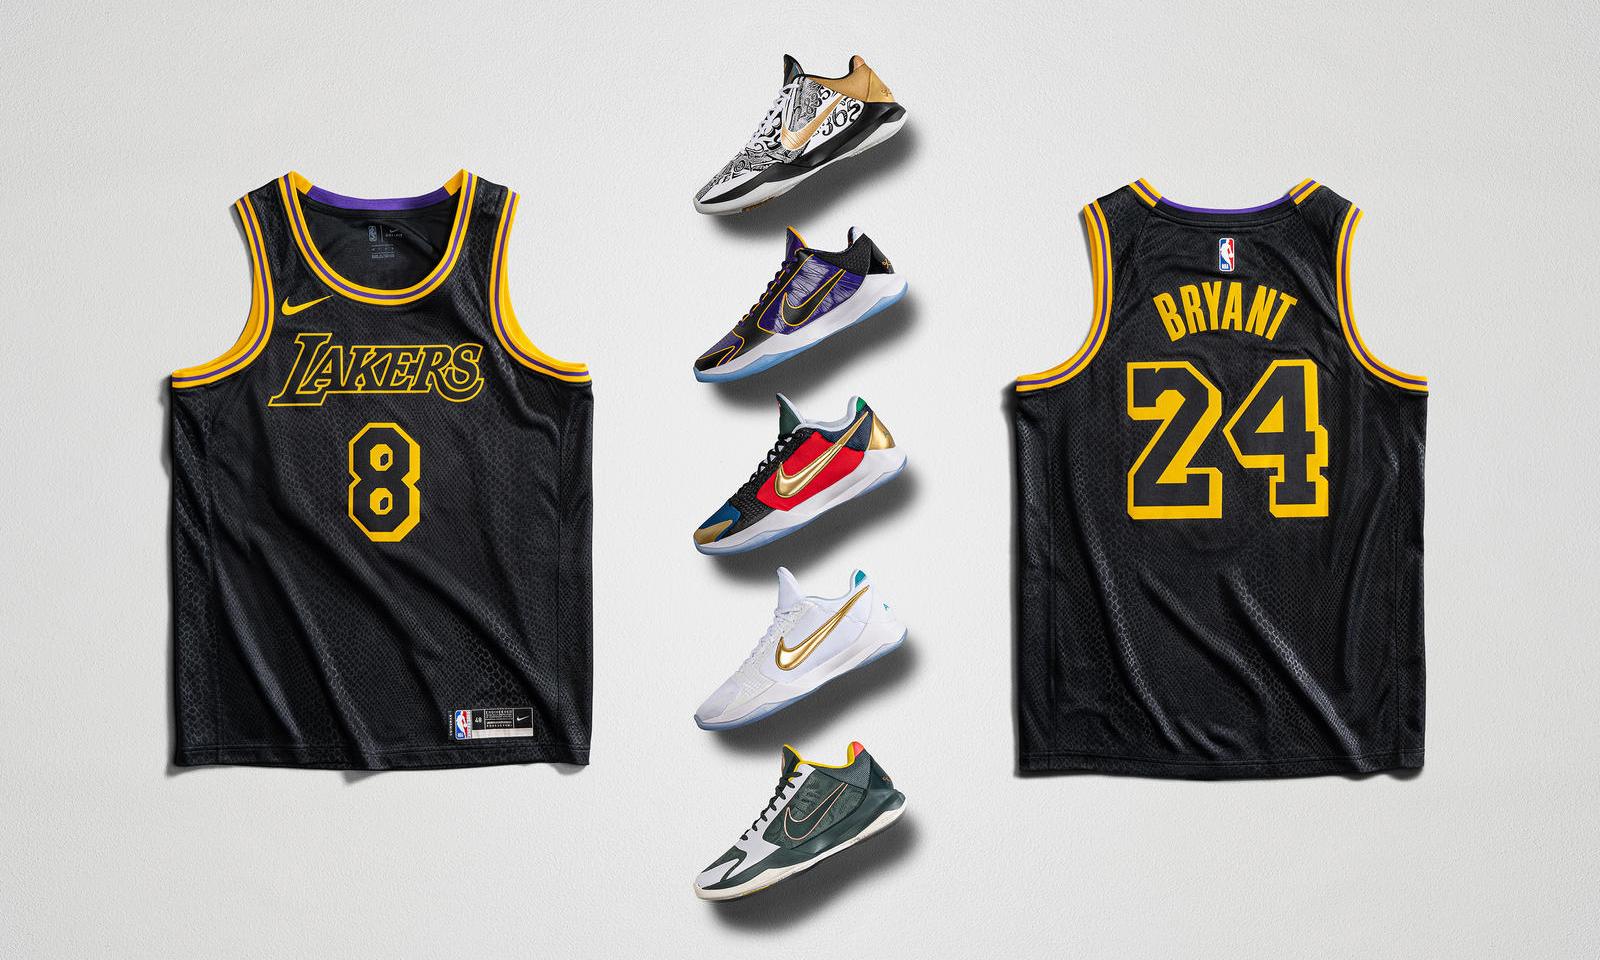 Nike「Mamba Week」重磅鞋款发售日程公开